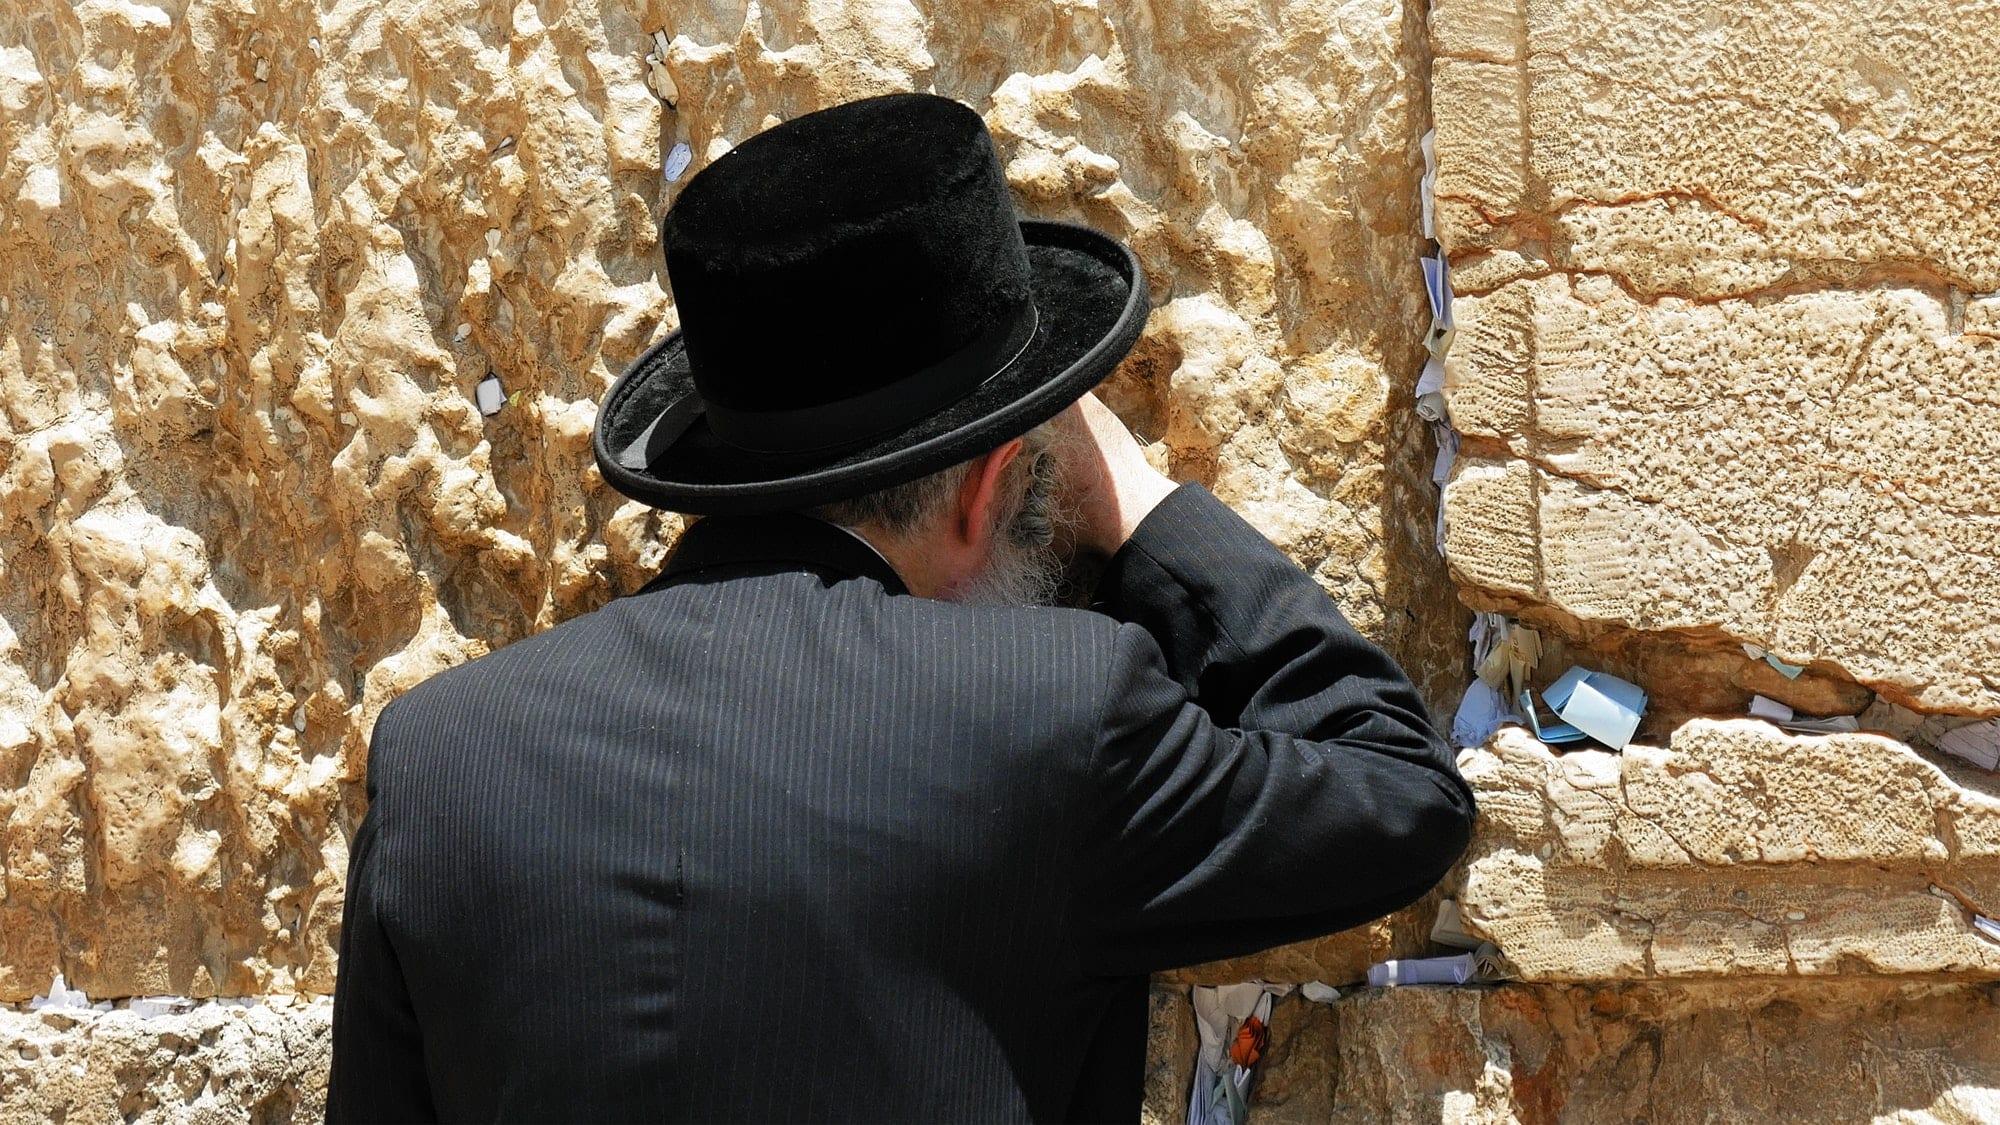 Jew prays at the Western Wall in Jerusalem